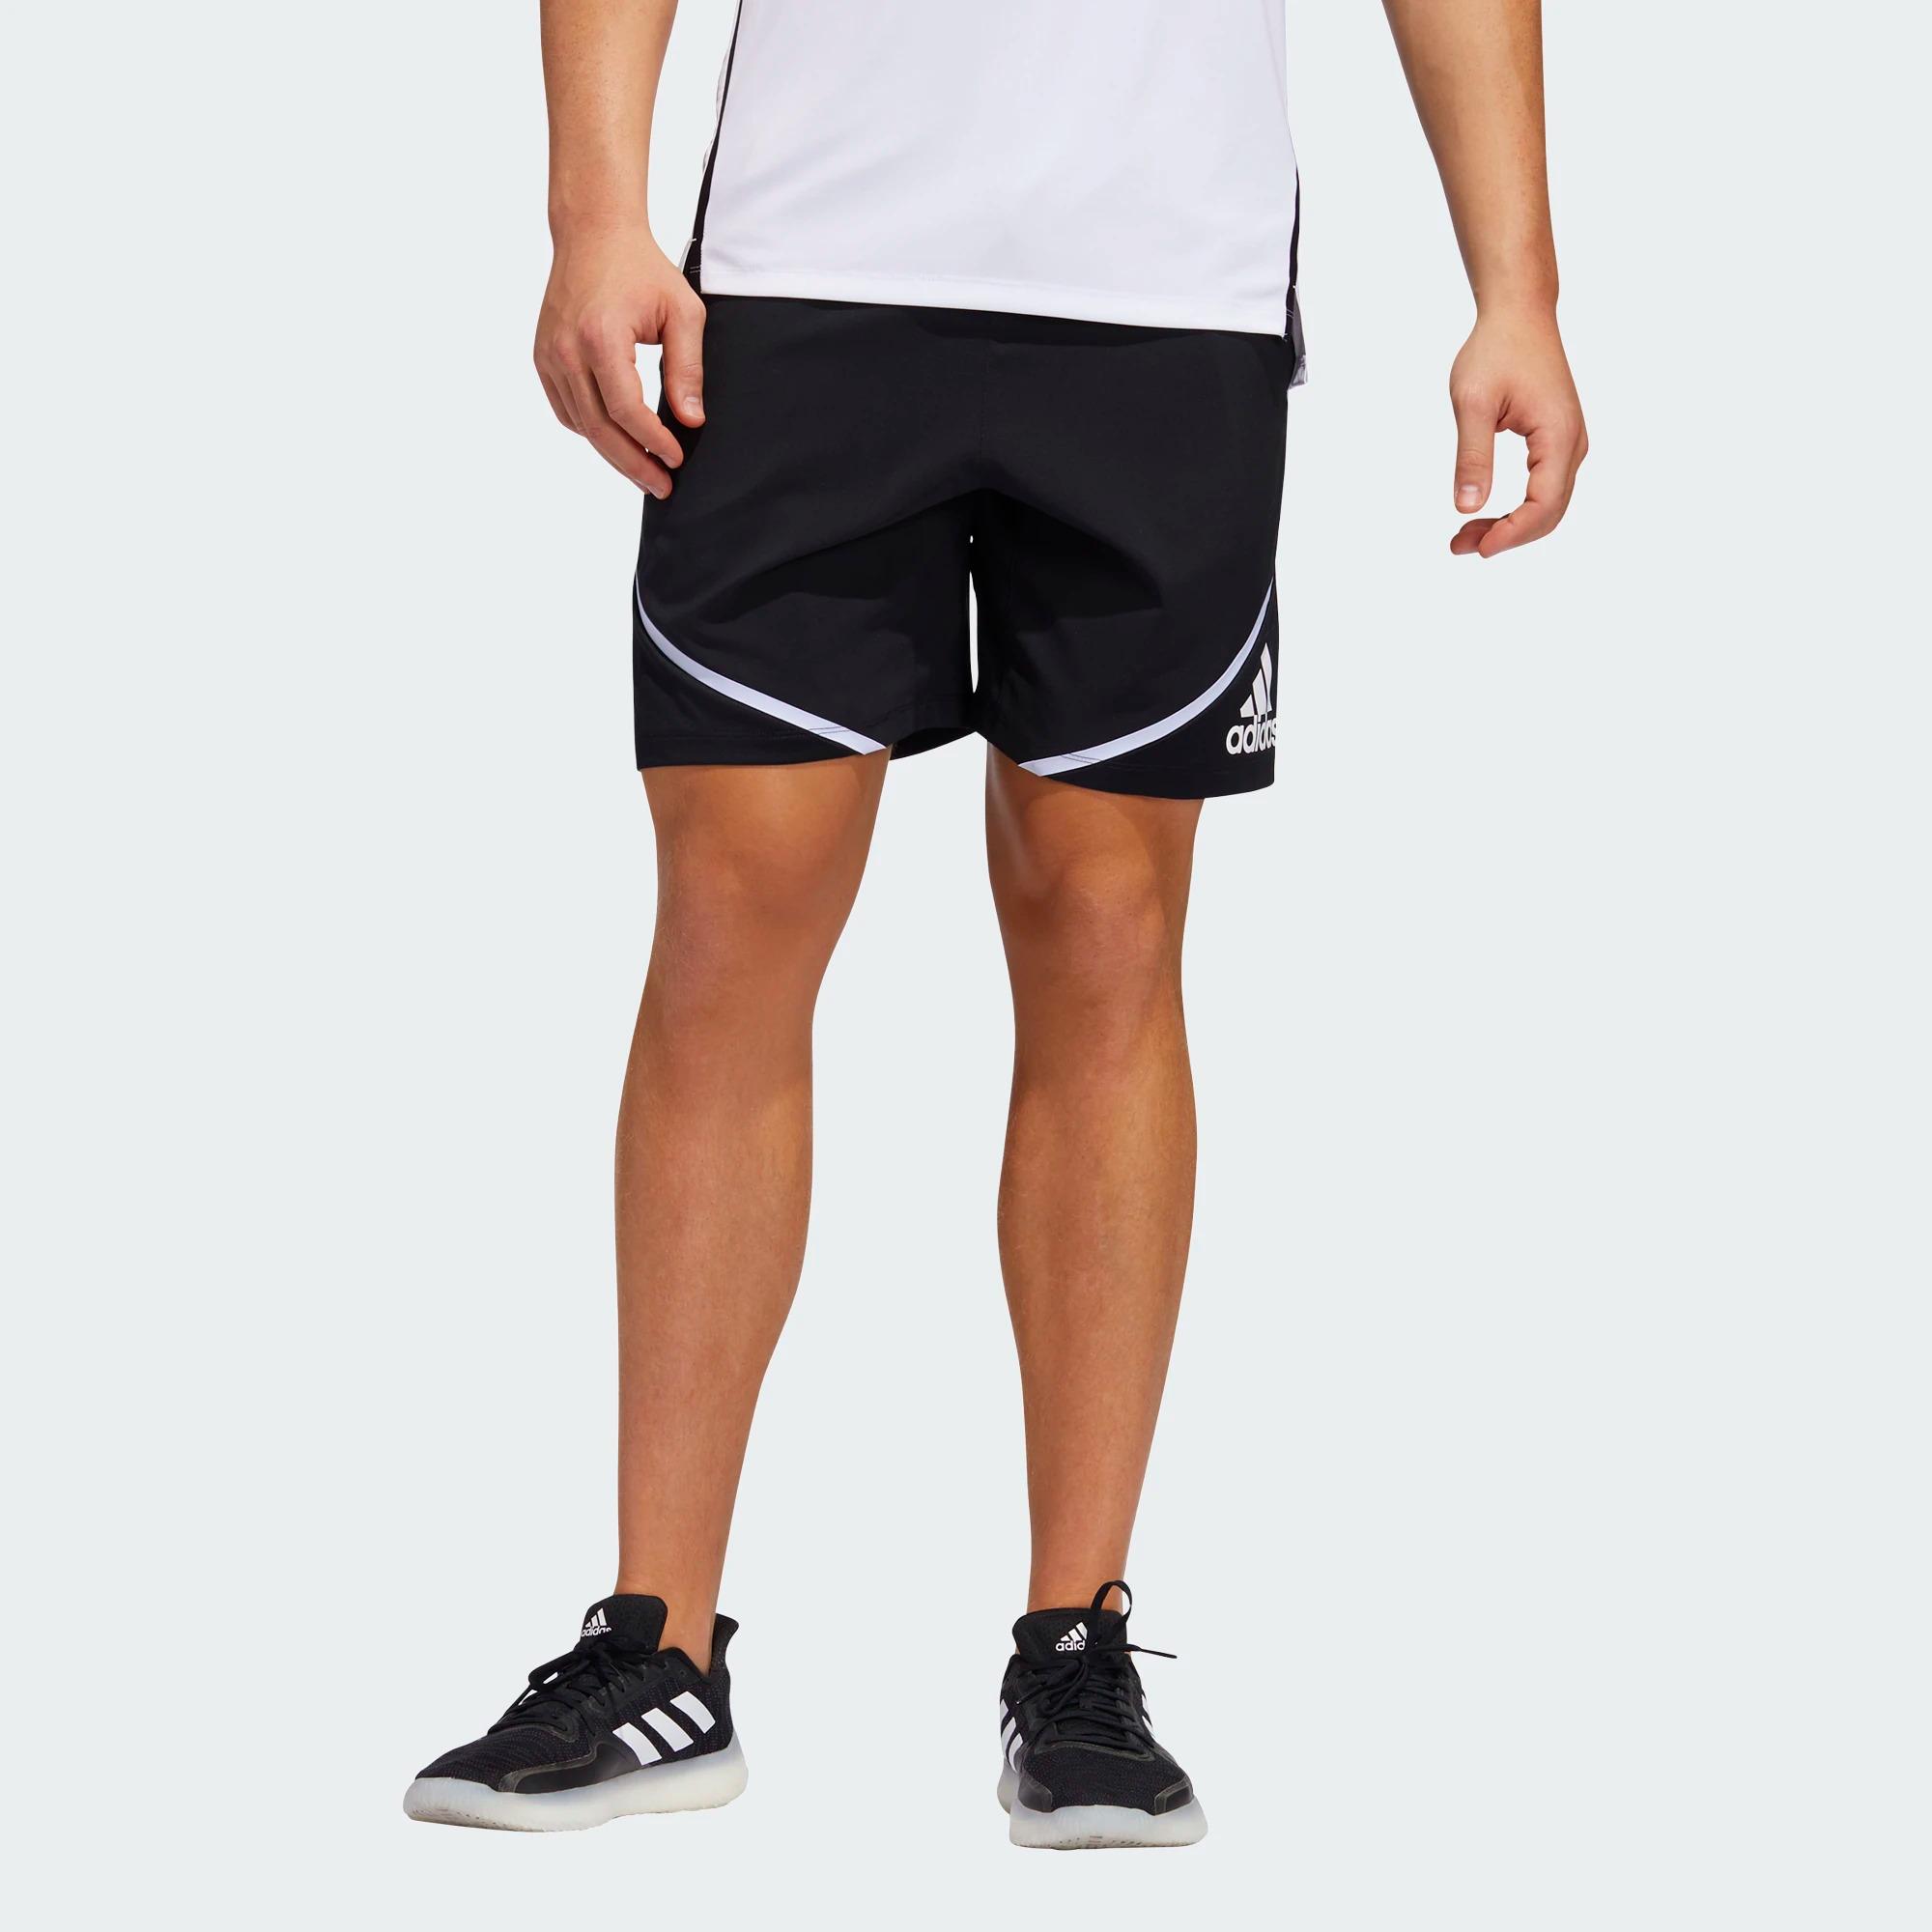 Adidas Primeblue Shorts